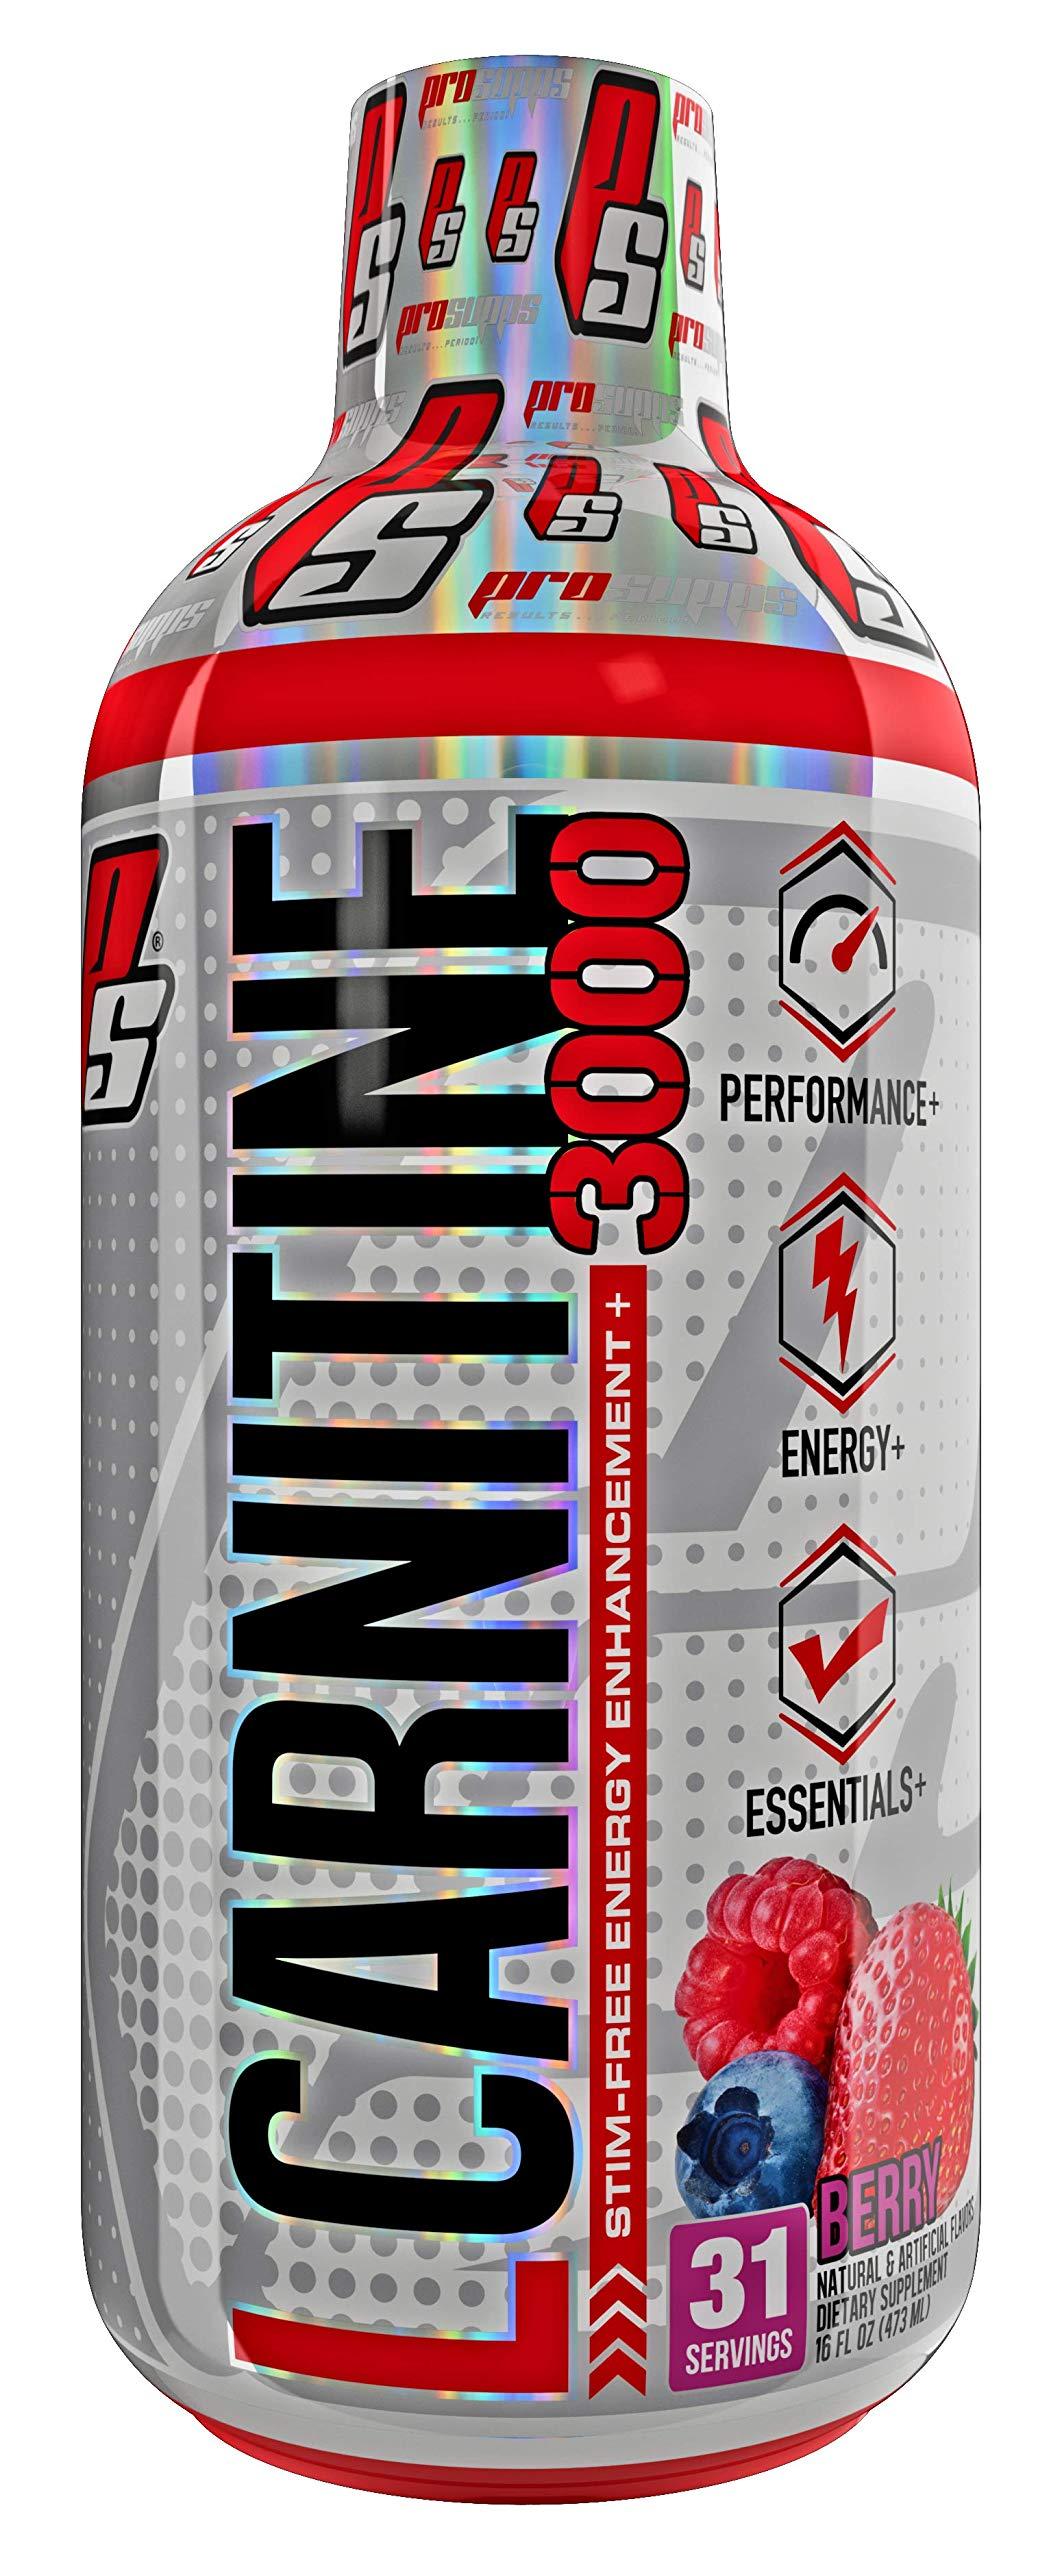 ProSupps L-Carnitine 3000 Liquid Fat Burner, Stimulant Free Metabolic Enhancer, 31 Servings (Berry Flavor) by PROSUPPS